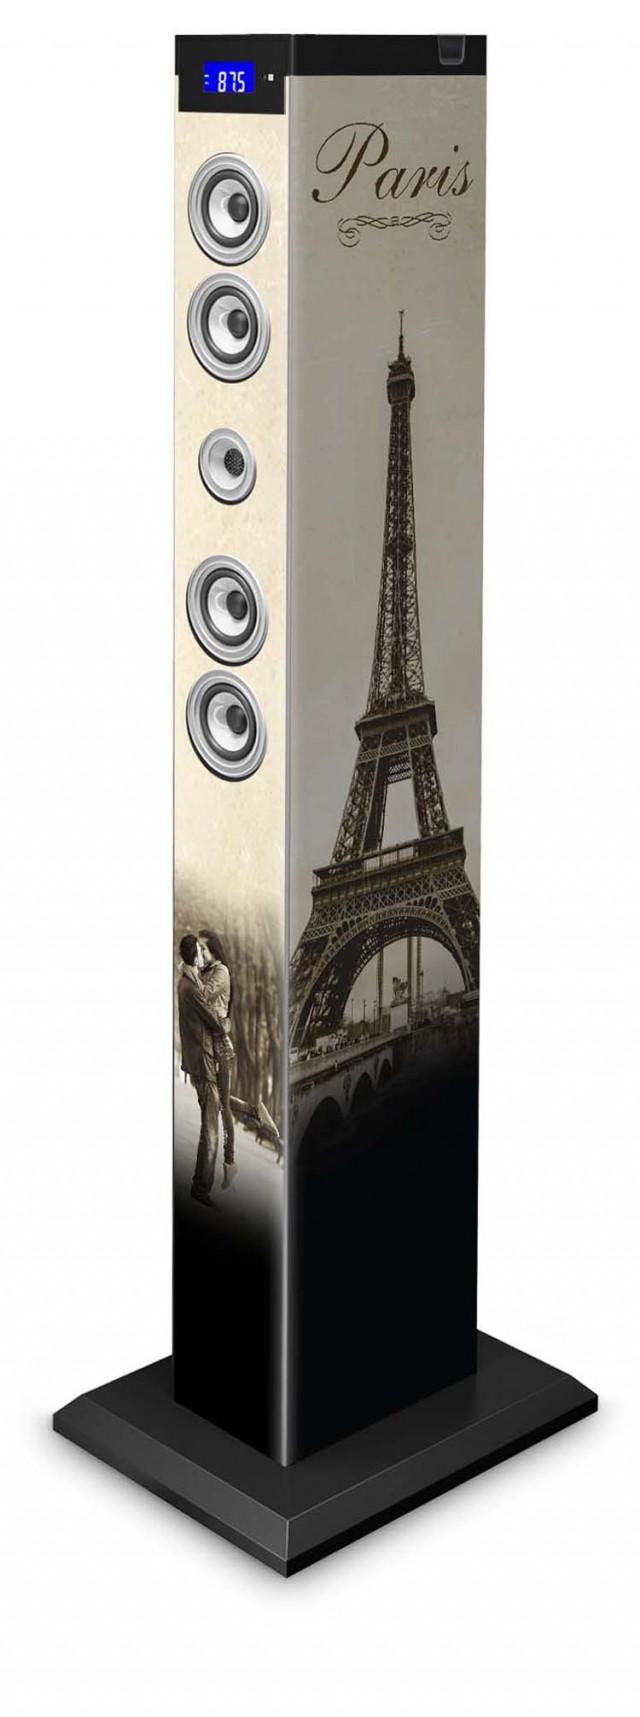 Tour Multimédia Paris - Packshot